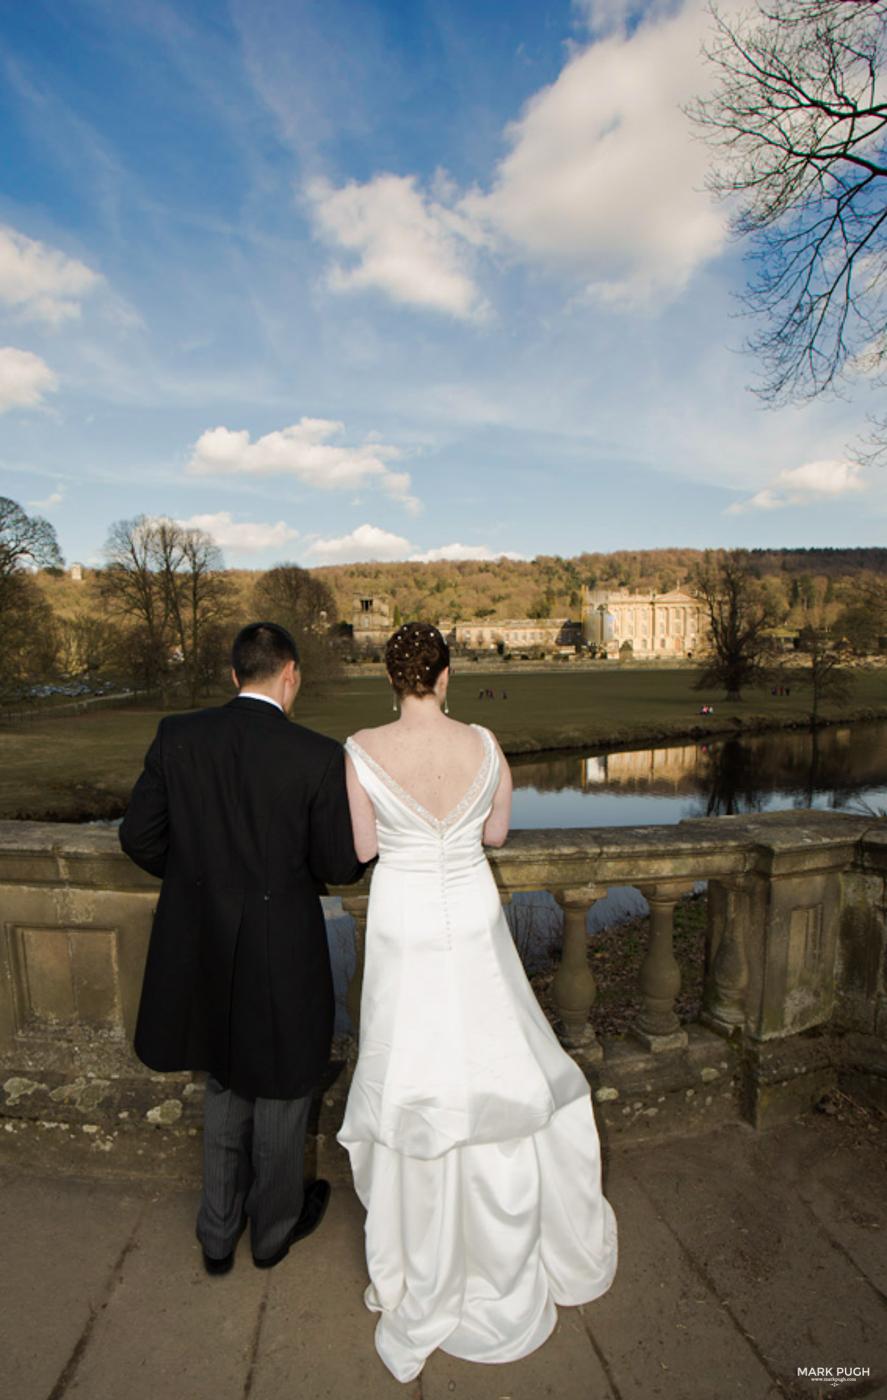 084  - Helen and Tim - Wedding Photography at Chatsworth House Bakewell Derbyshire DE45 1PP - Wedding Photographer Mark Pugh www.markpugh.com -153.JPG